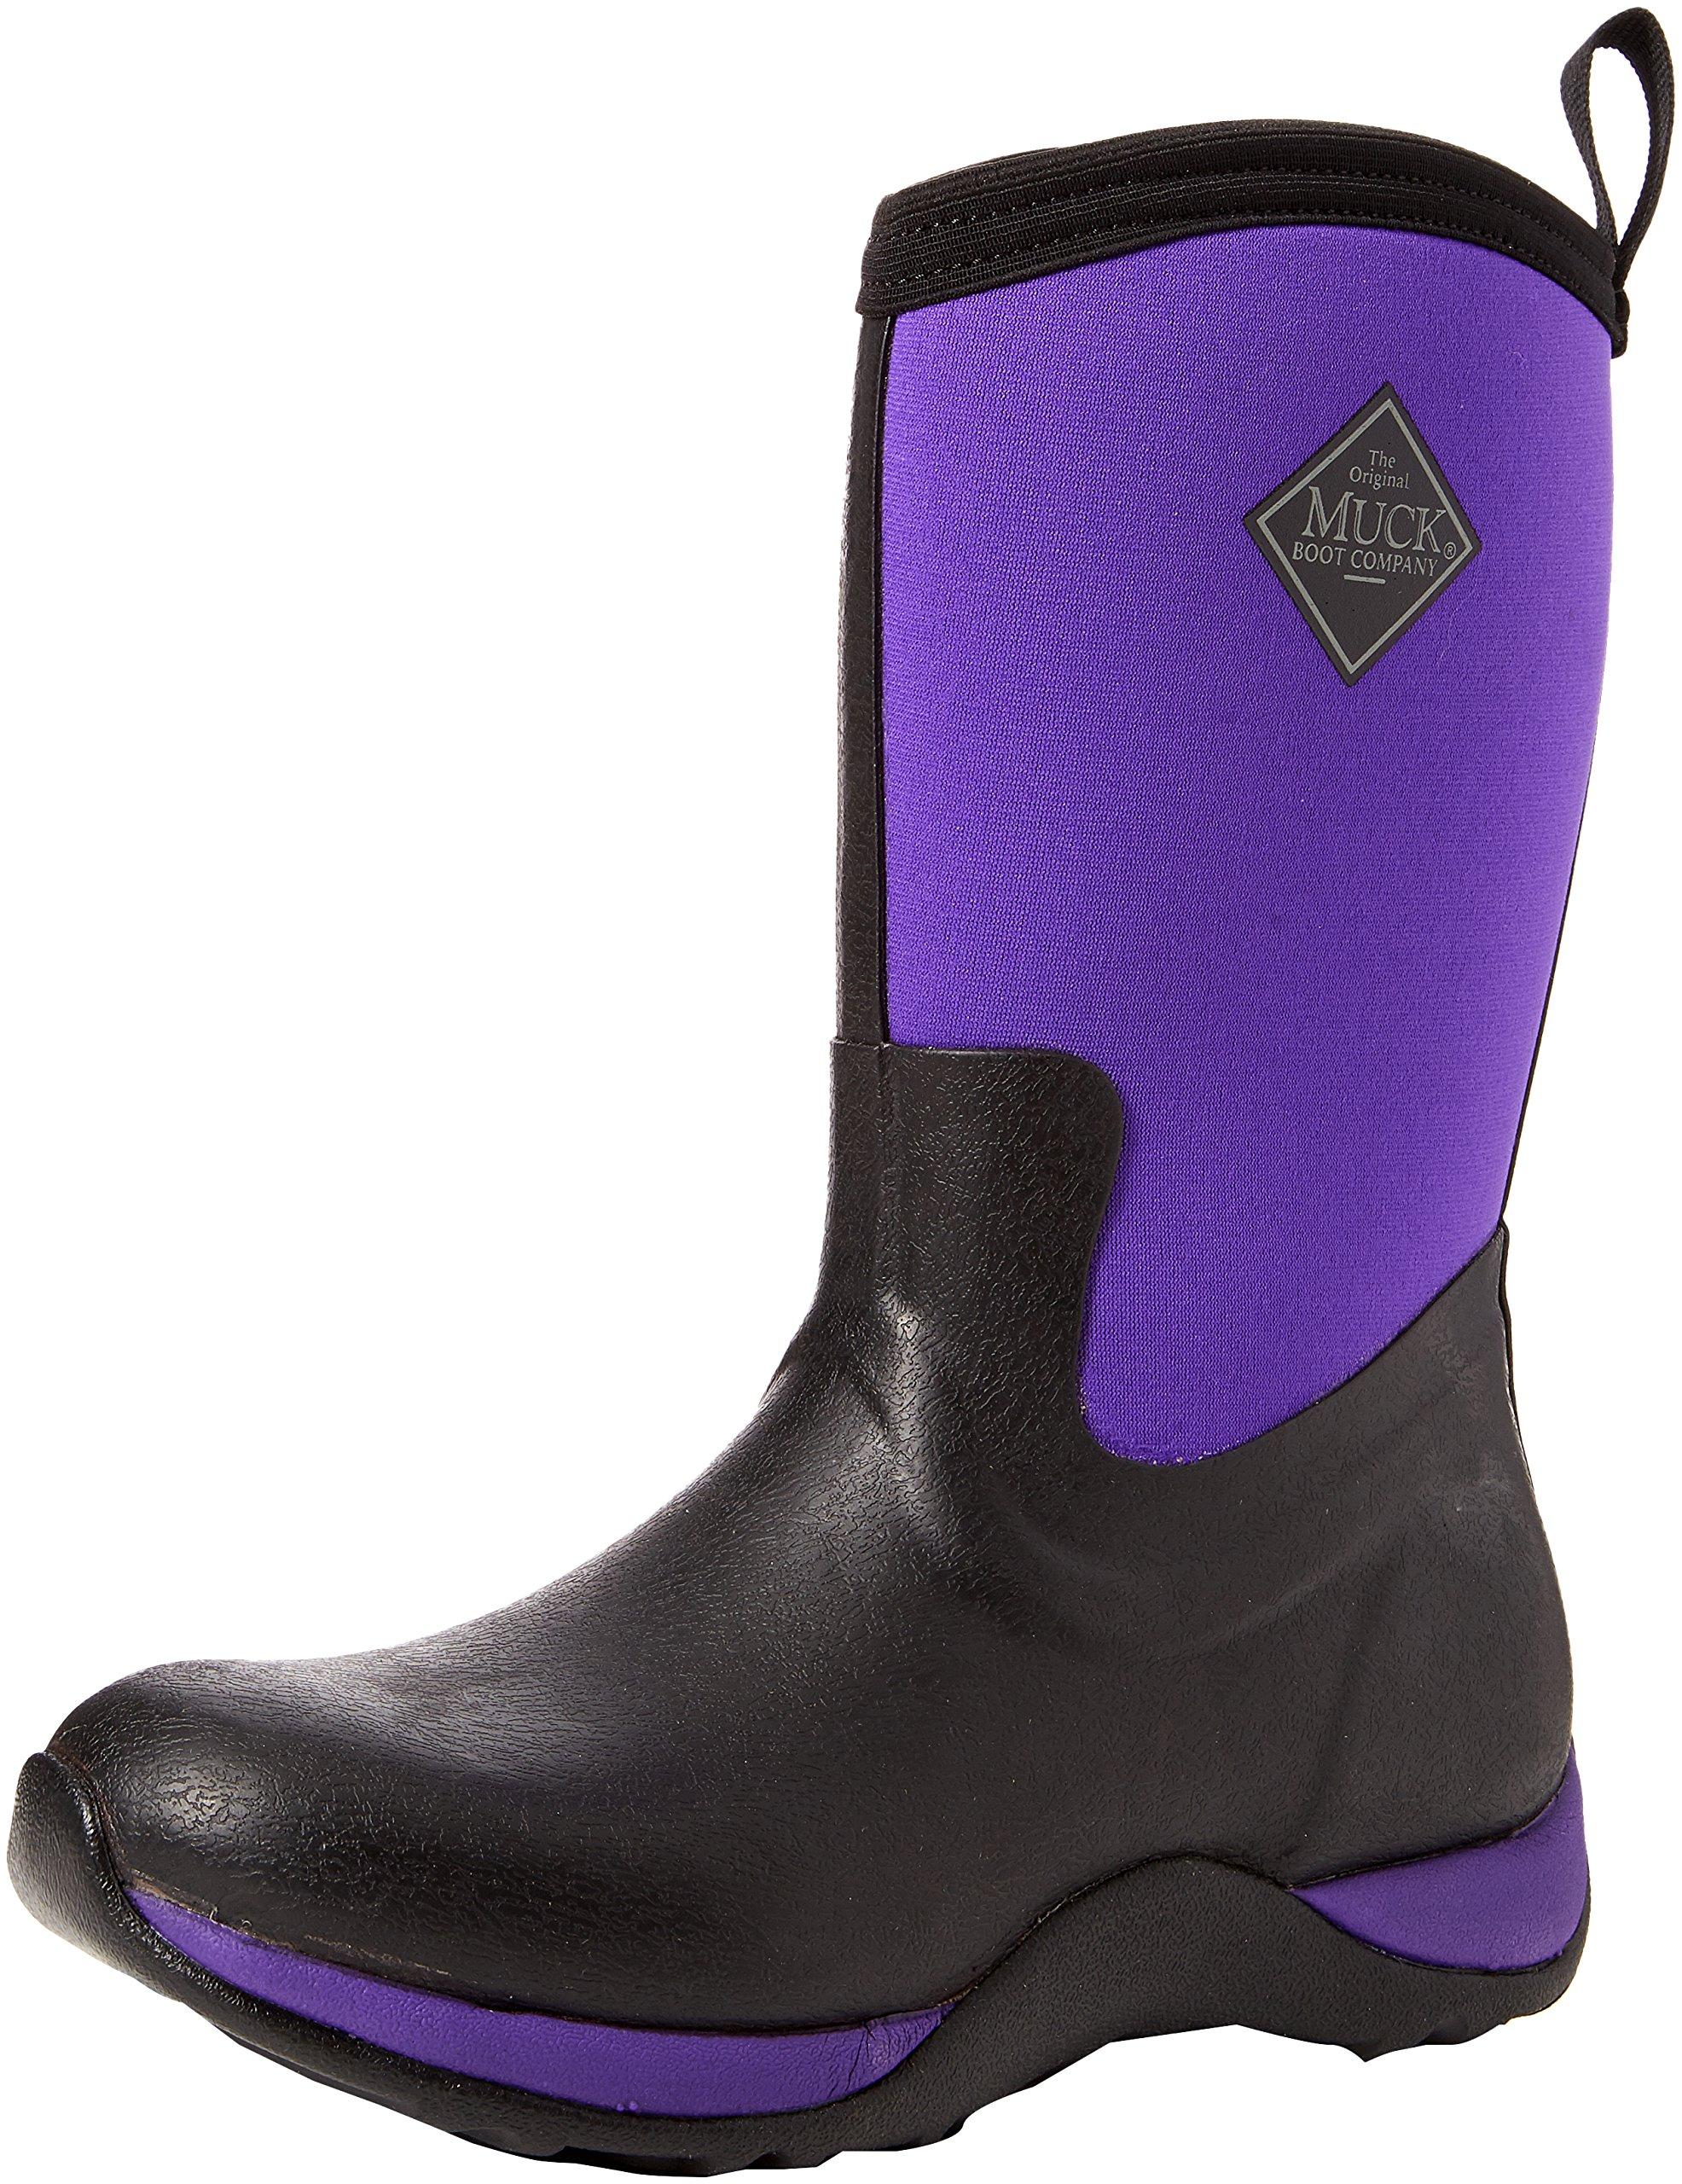 Pluie Women's Arctic WeekendBottesamp; Boots Bottines De FemmeNoirblack purple36 Muck Eu FJc1Kl3T